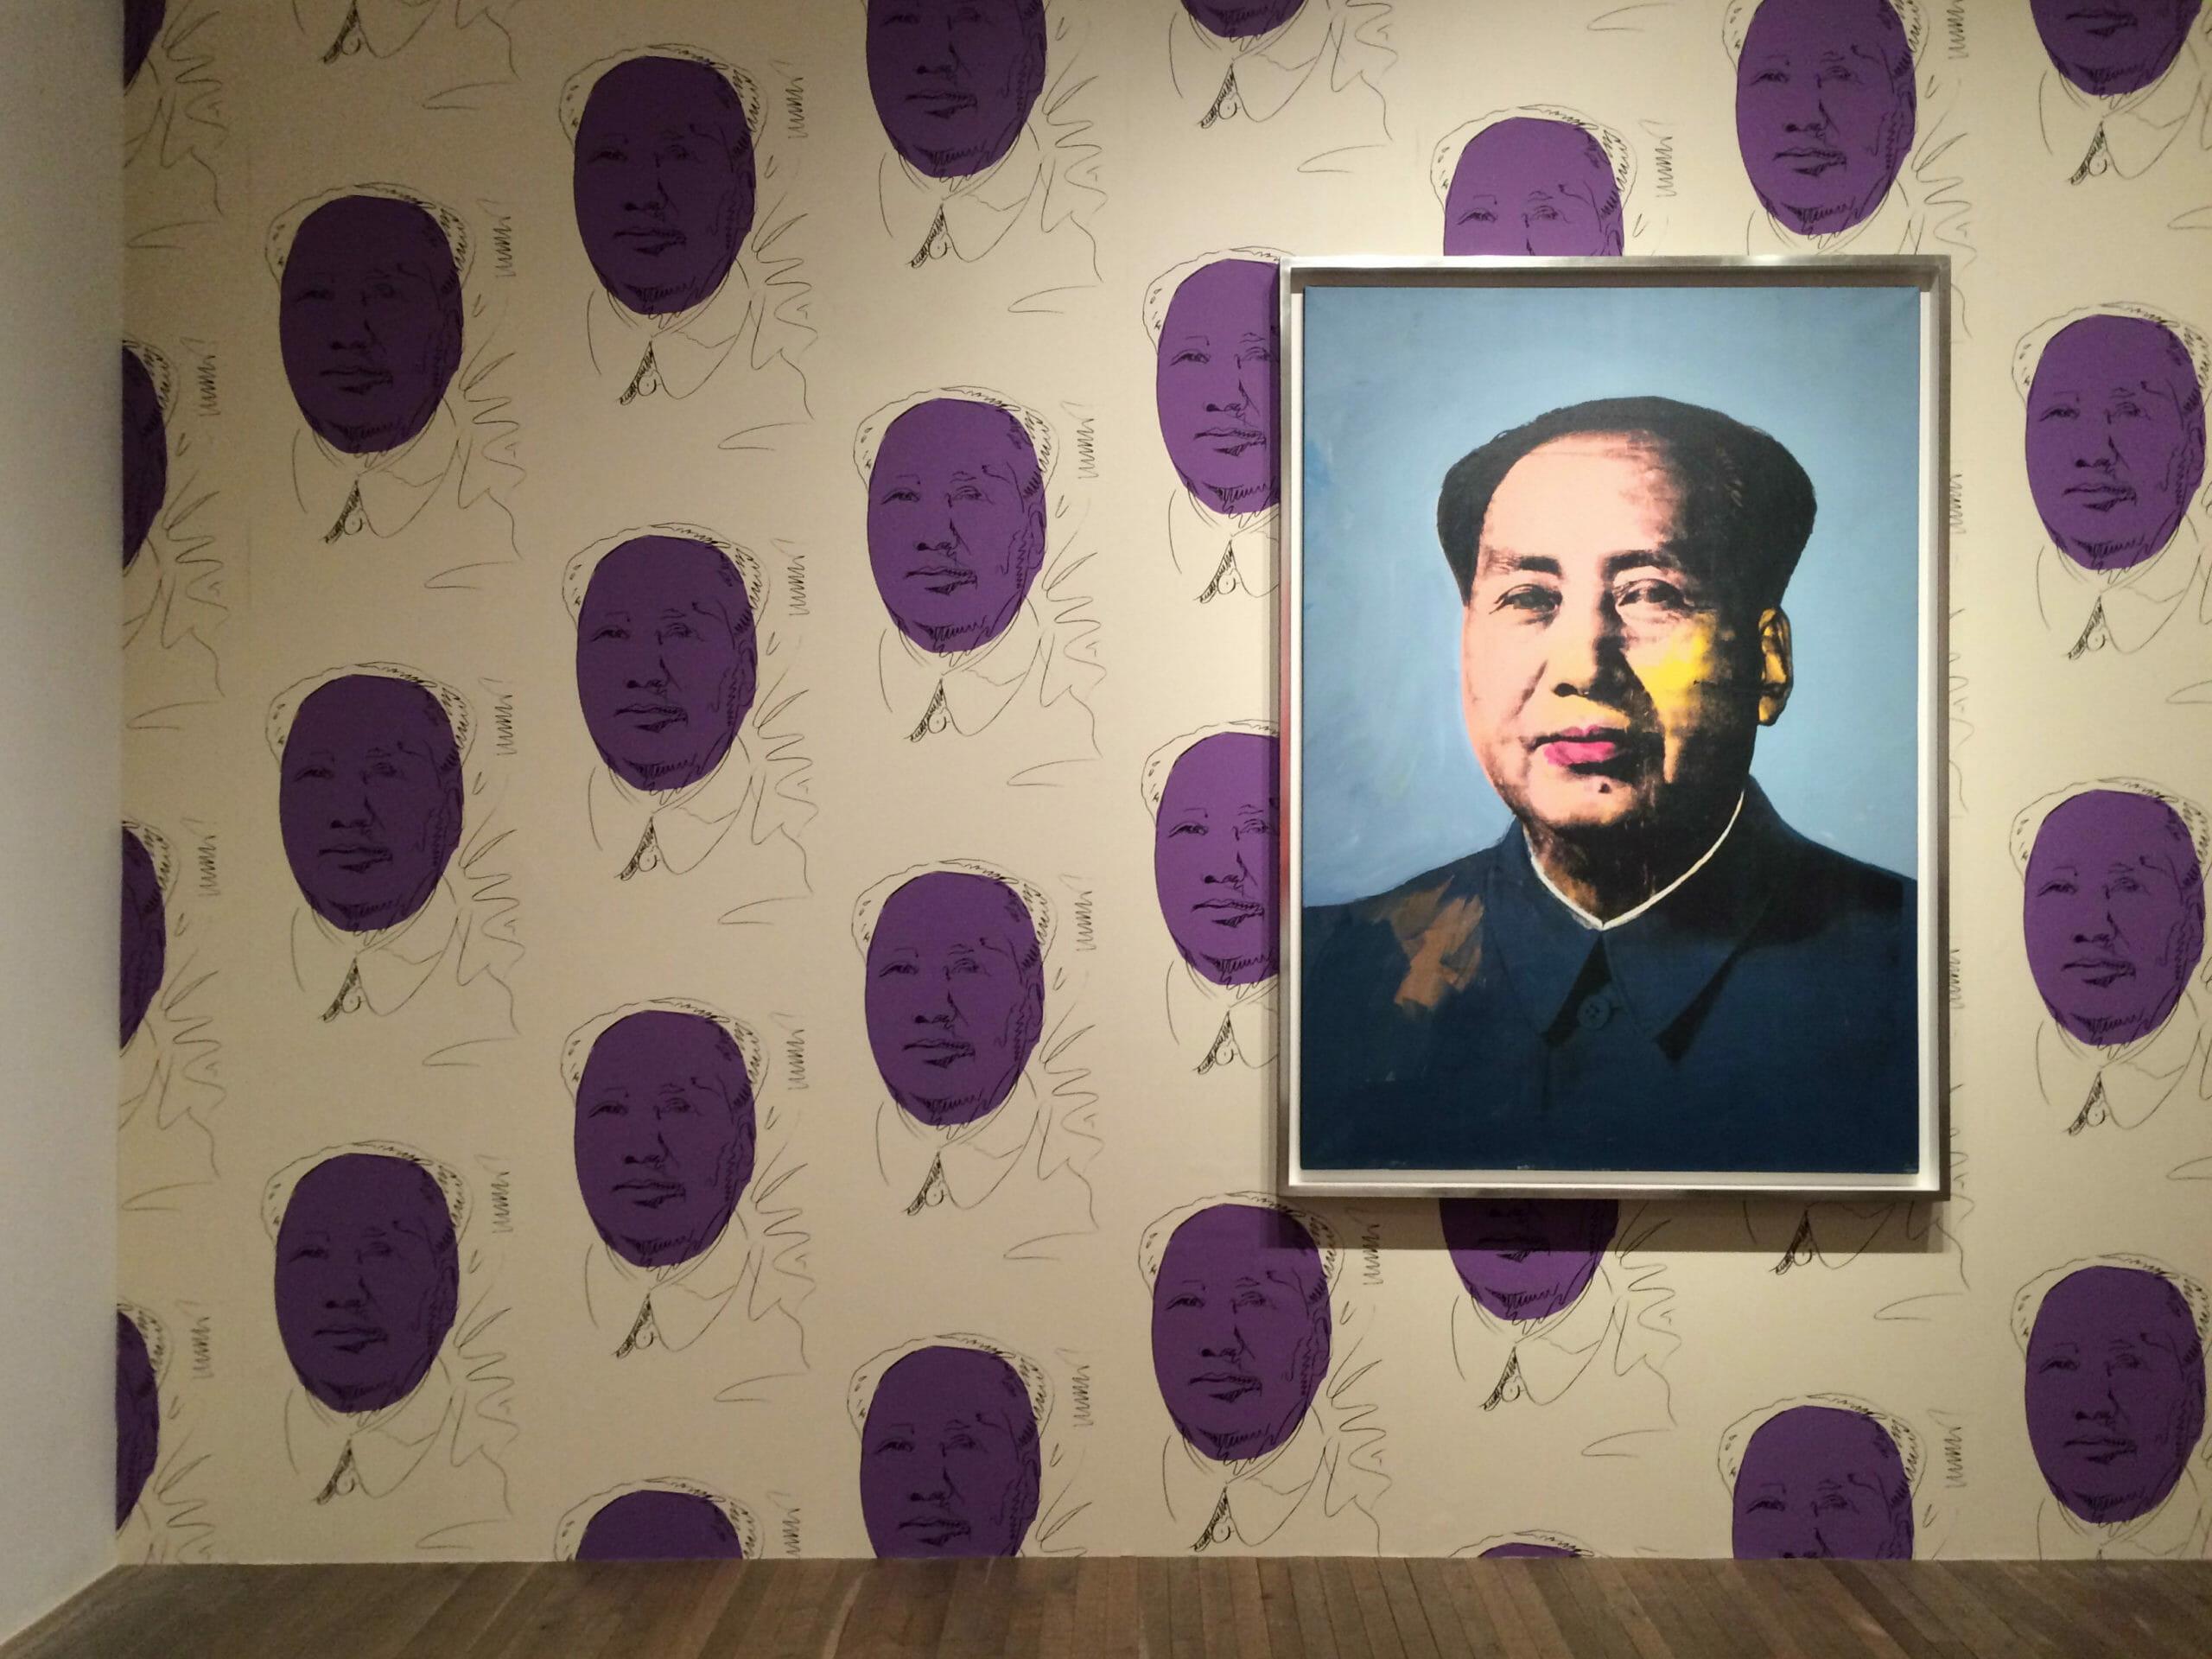 Andy Warhol Tate Modern exhibition